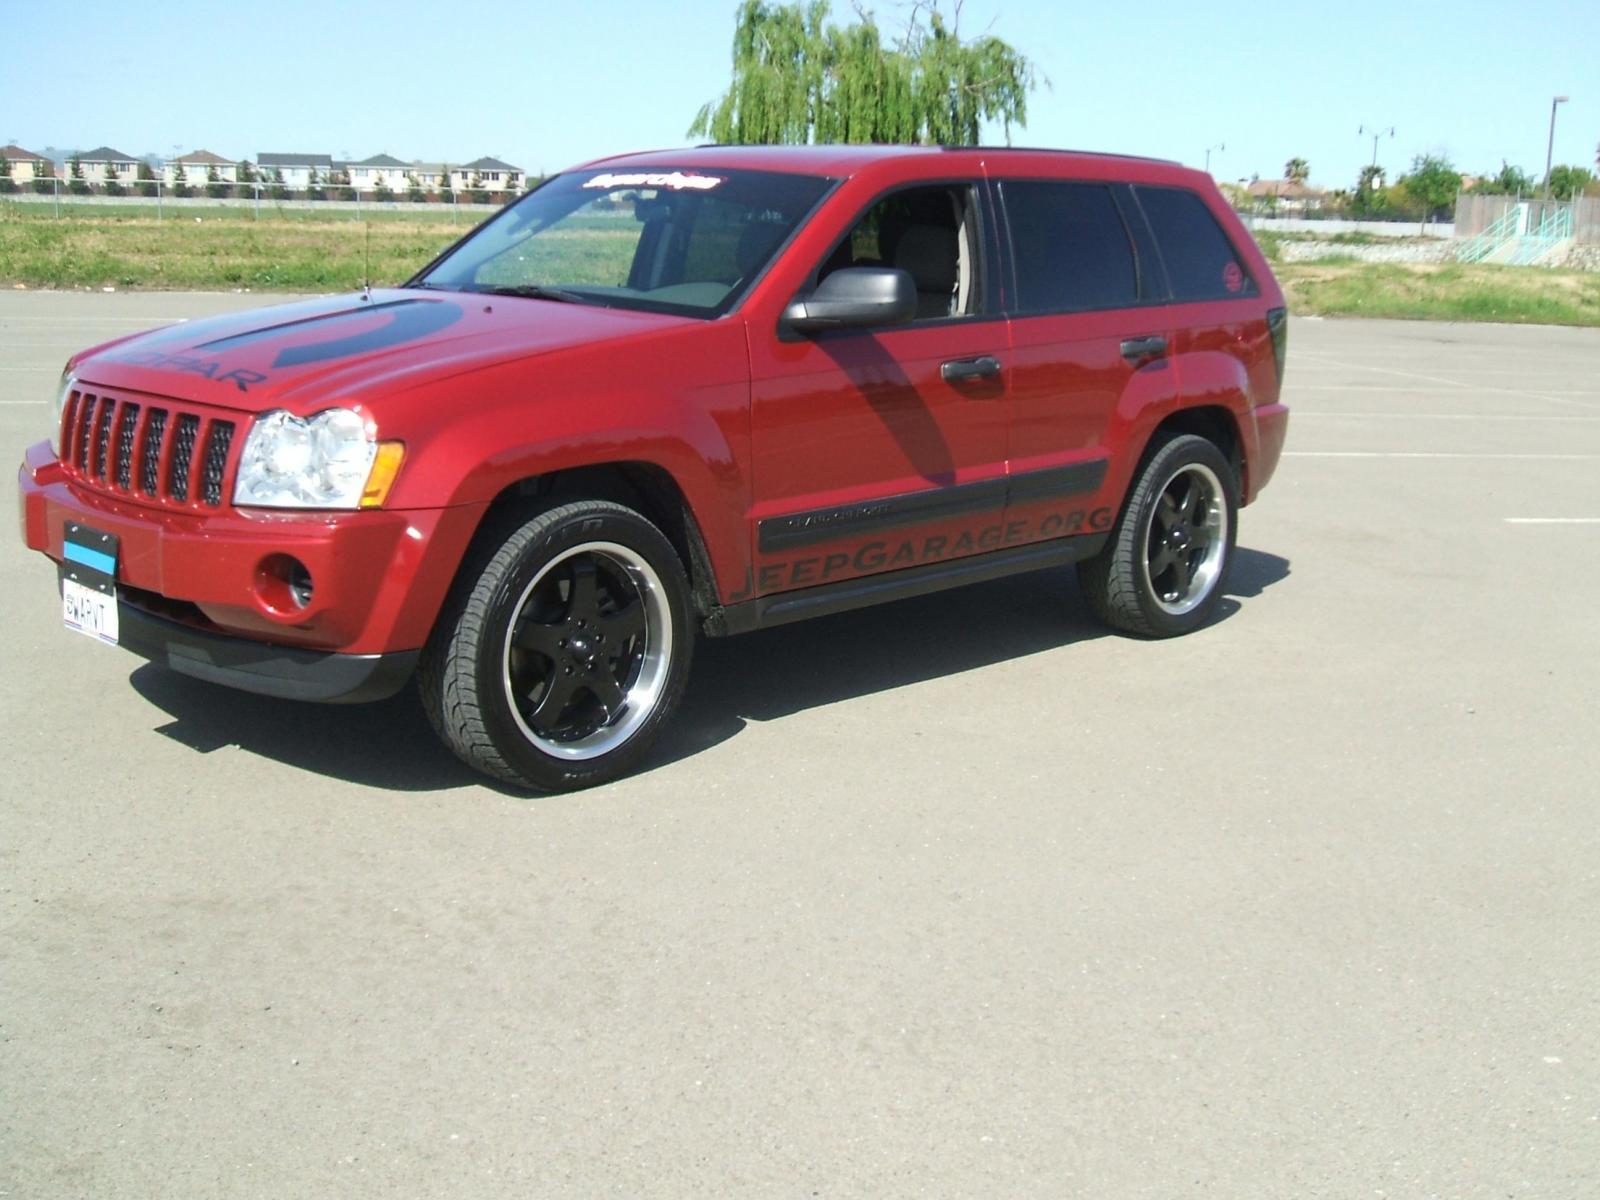 04162010 Jeep pics 001